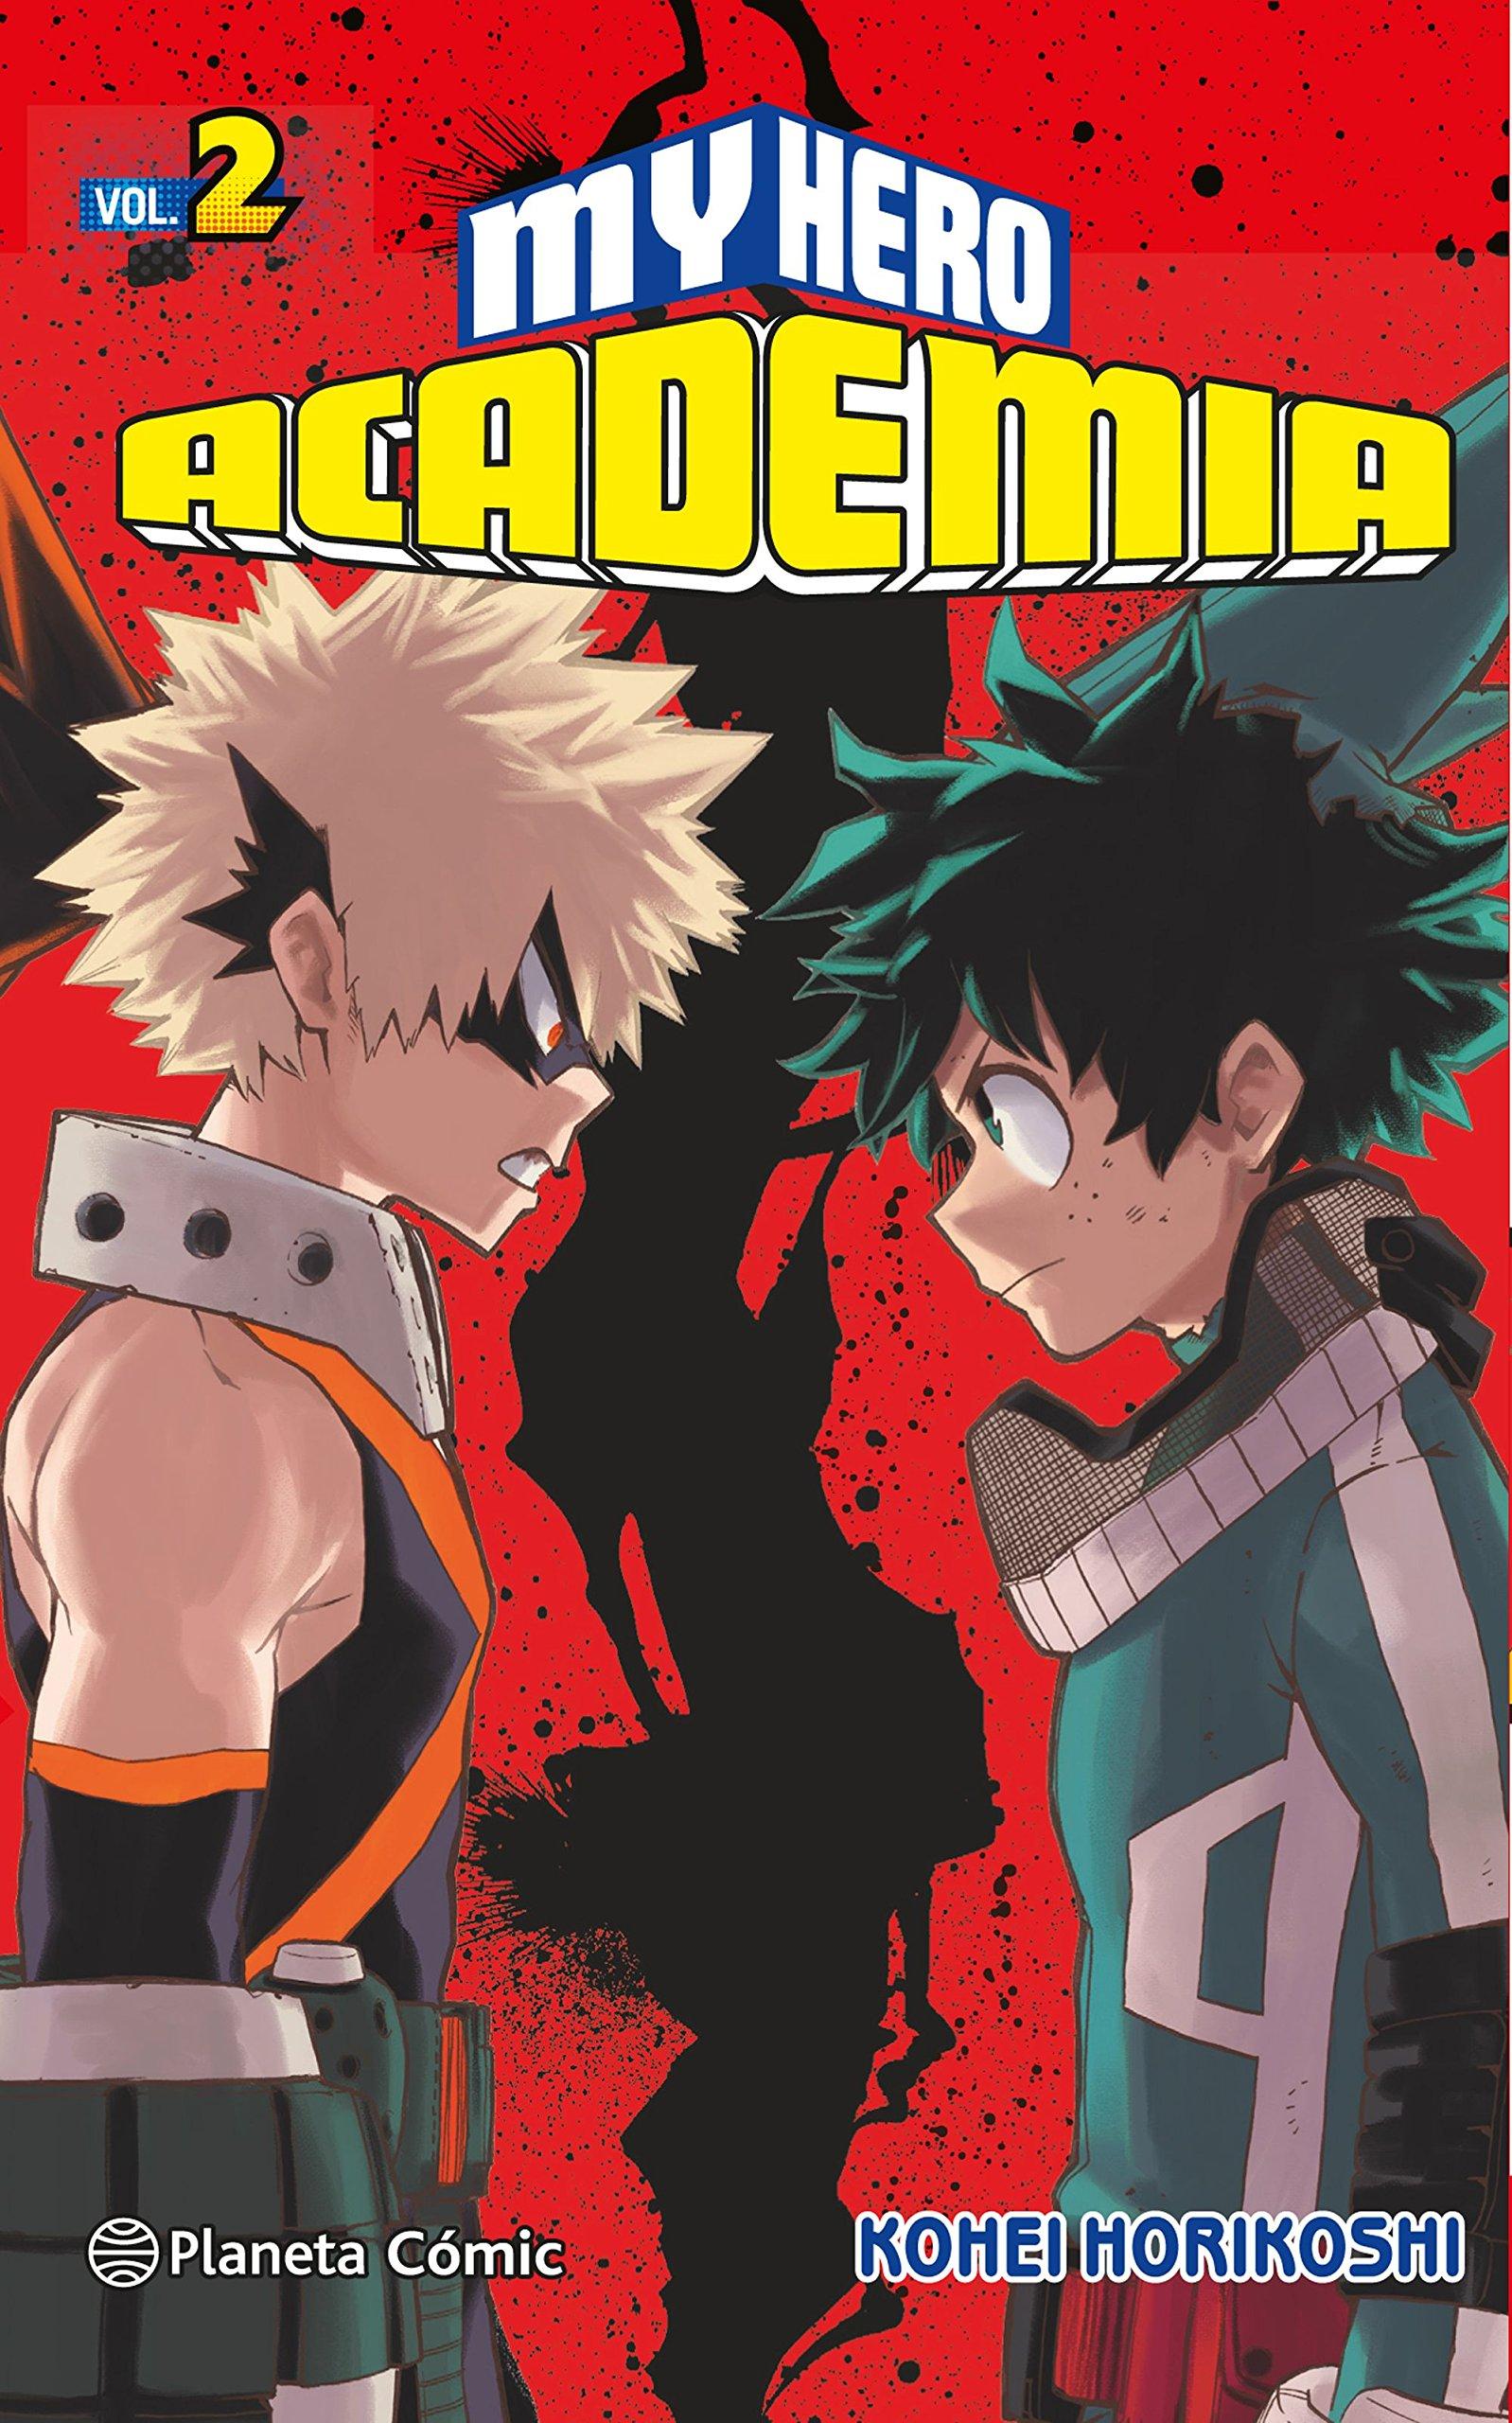 My Hero Academia nº 02 (Manga Shonen) Tapa blanda – 29 nov 2016 Kohei Horikoshi Daruma Planeta DeAgostini Cómics 841669351X